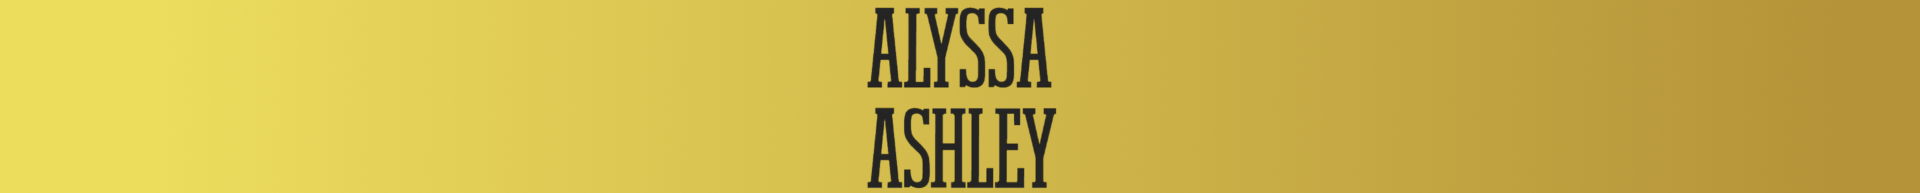 ALYSSA ASHLEY